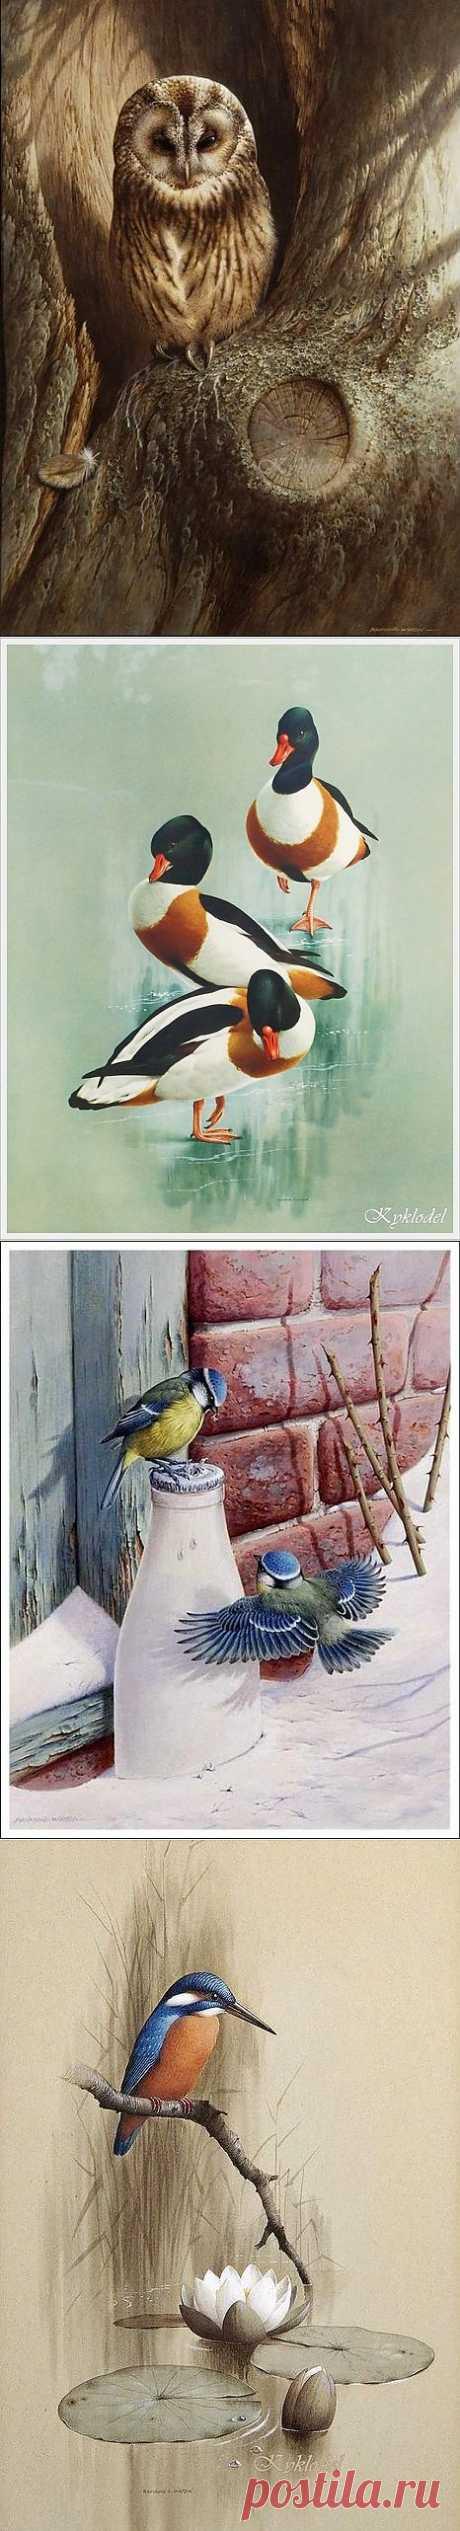 Птицы акварелью Raymond Cyril Watson - Ярмарка Мастеров - ручная работа, handmade